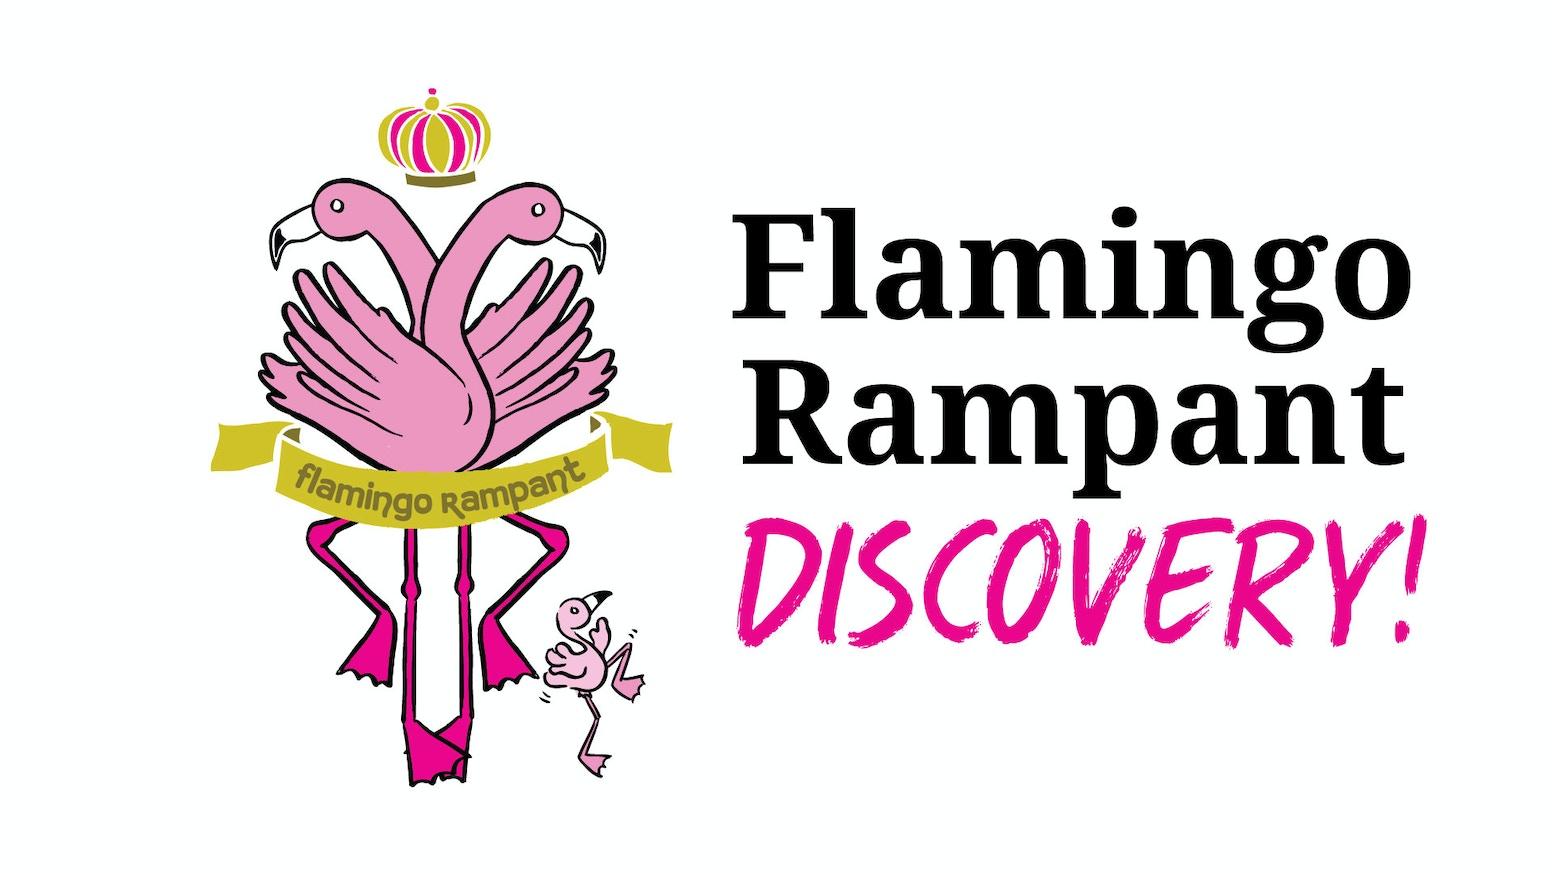 Flamingo Rampant 2019: Discovery!